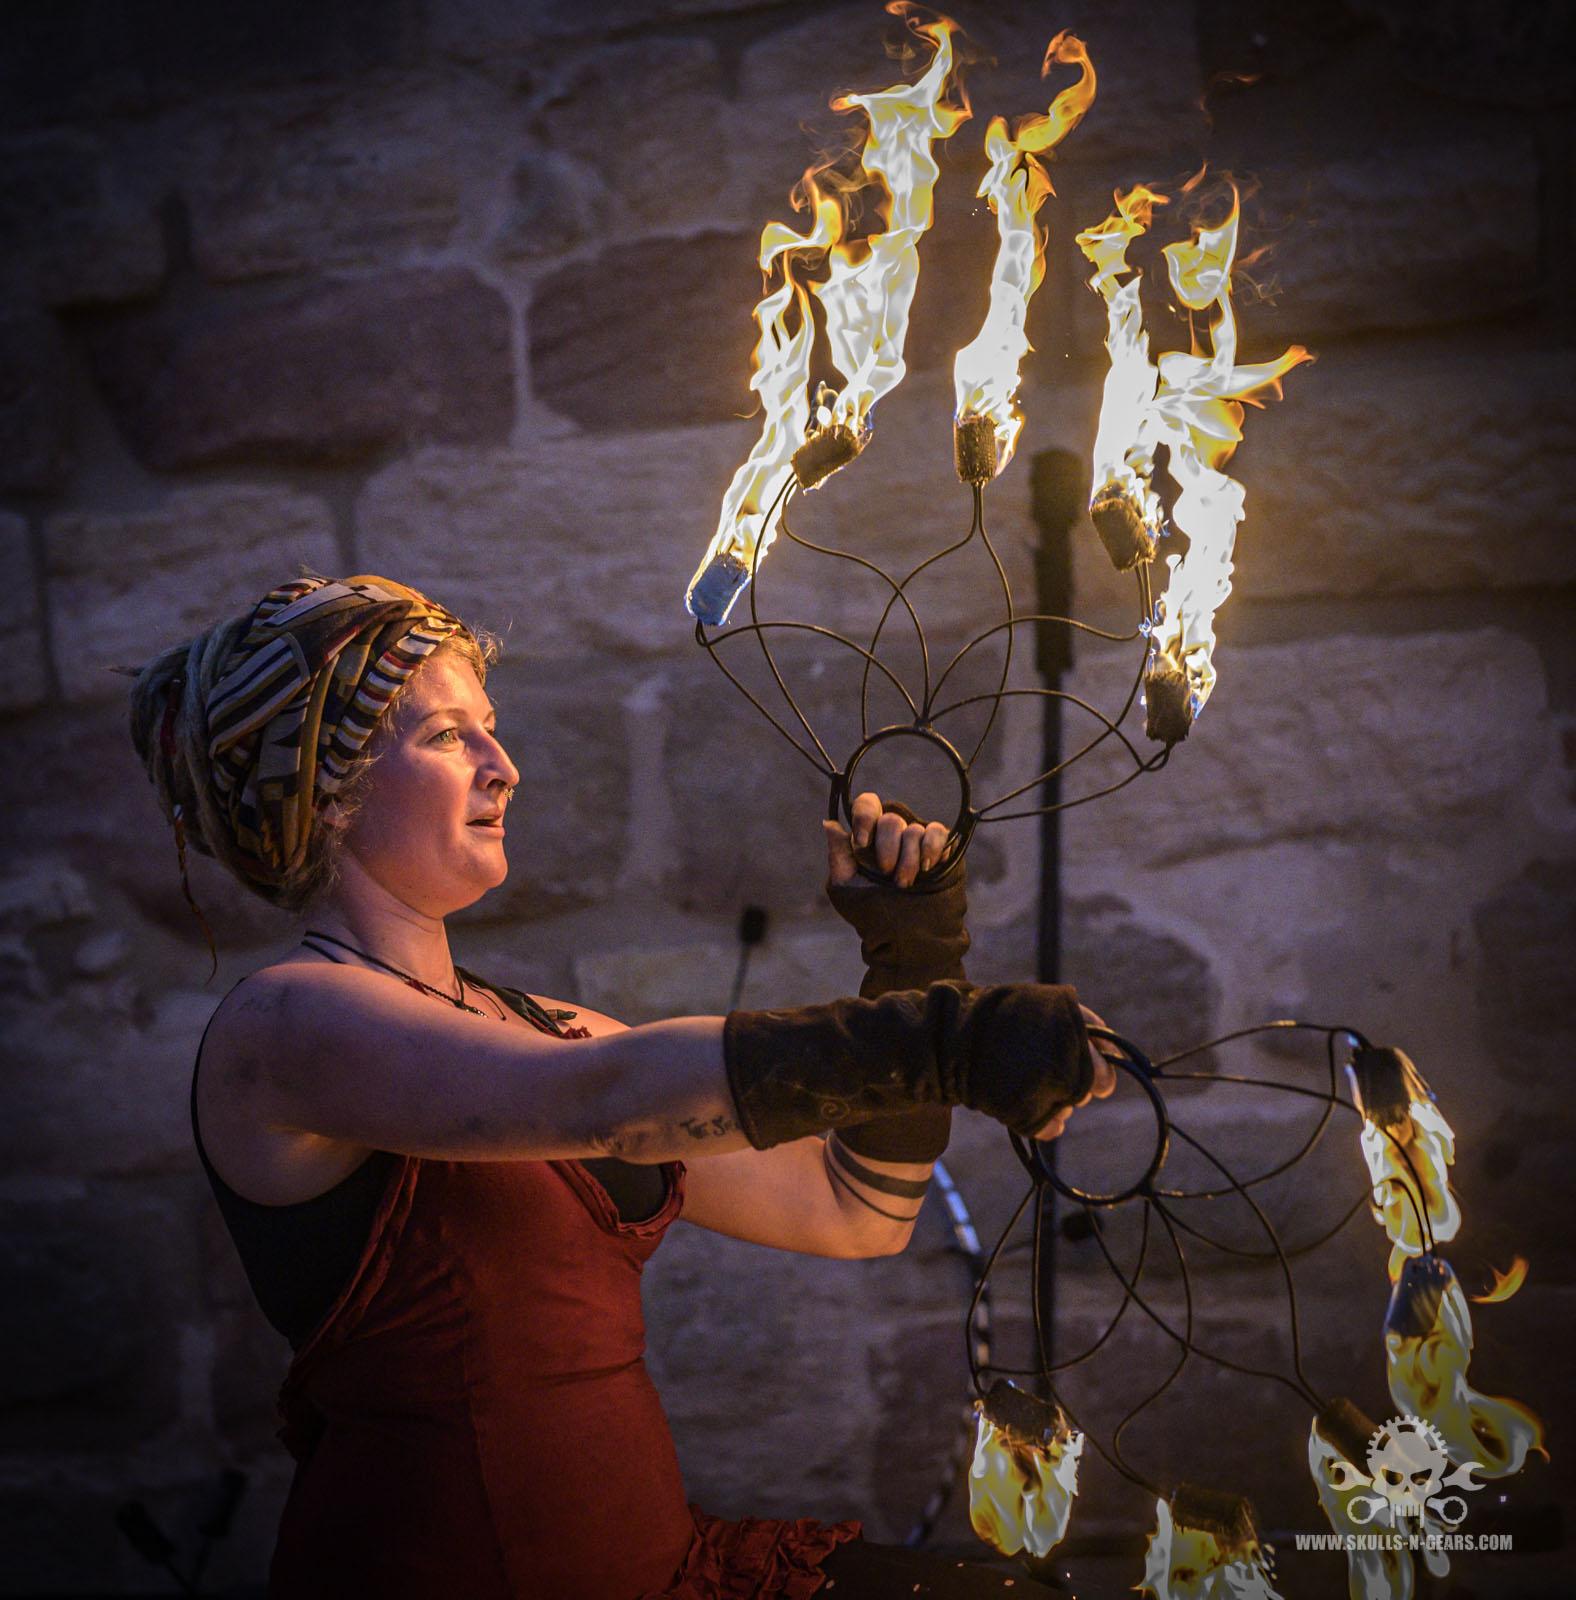 Feuertanz Festival 2019 - Feuershow-1212